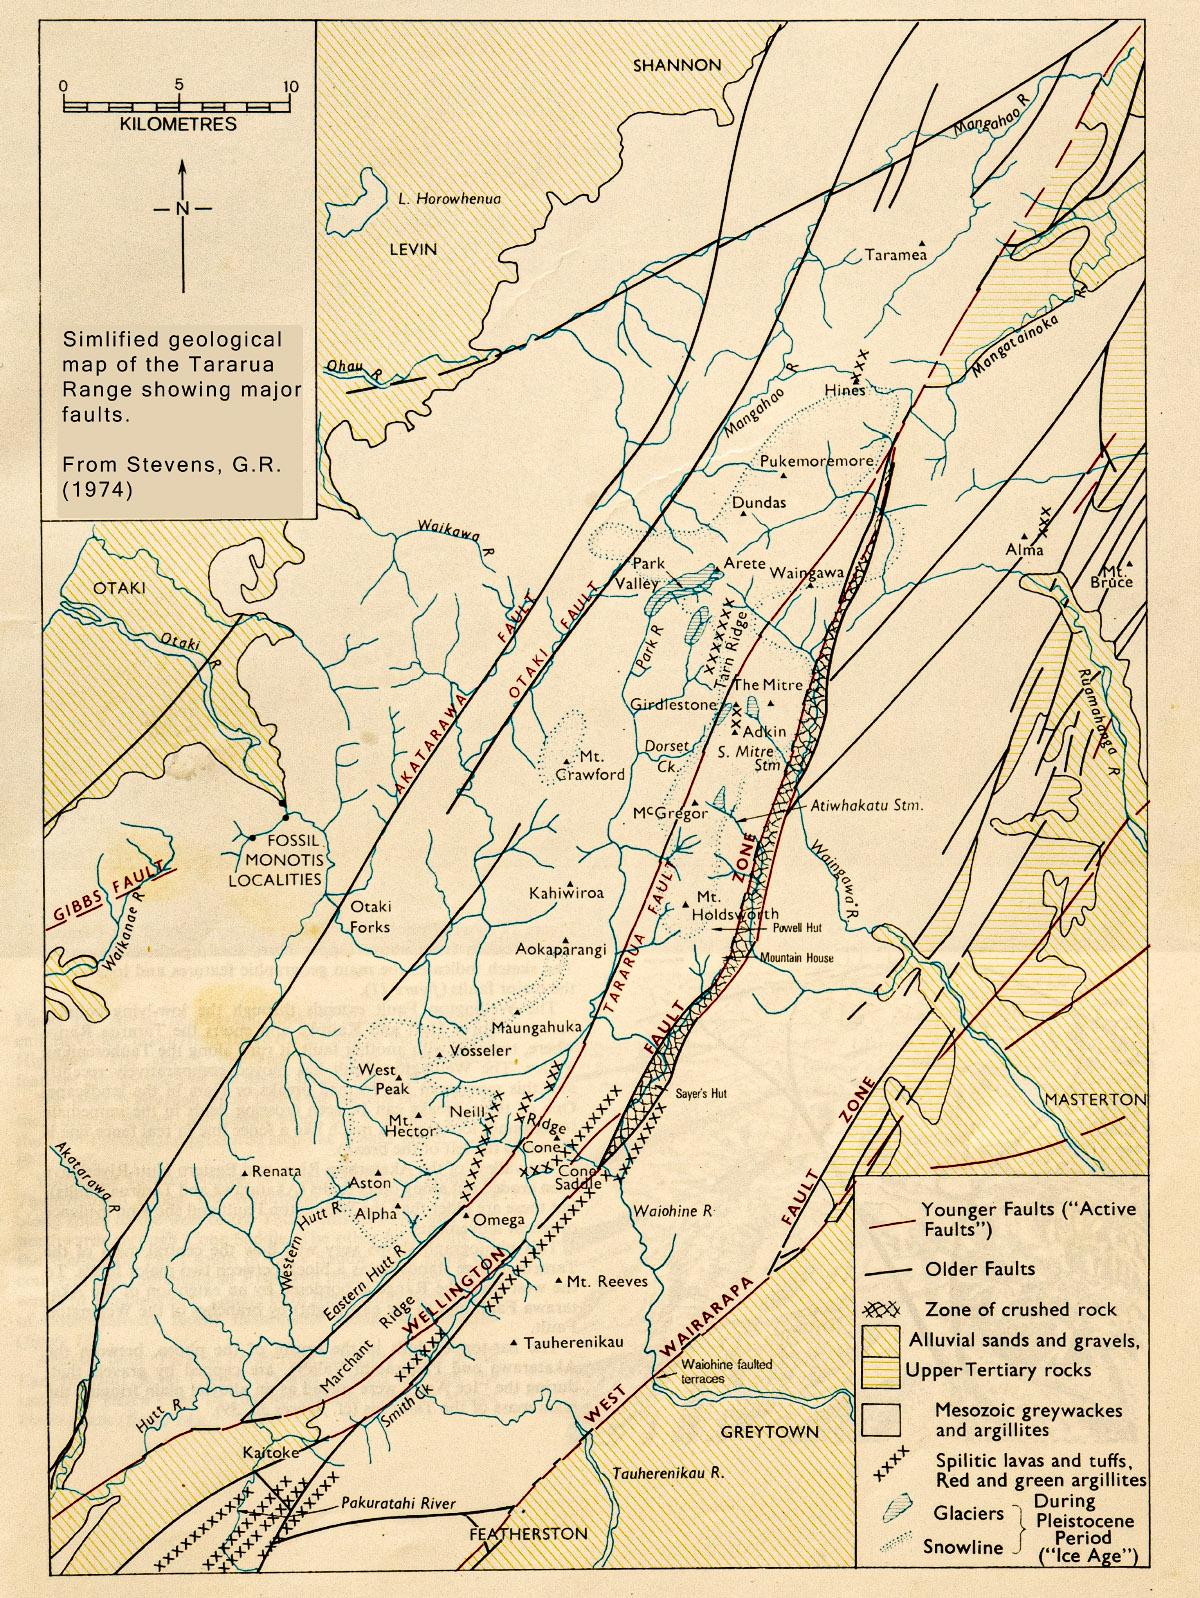 Major faults of the Tararuas